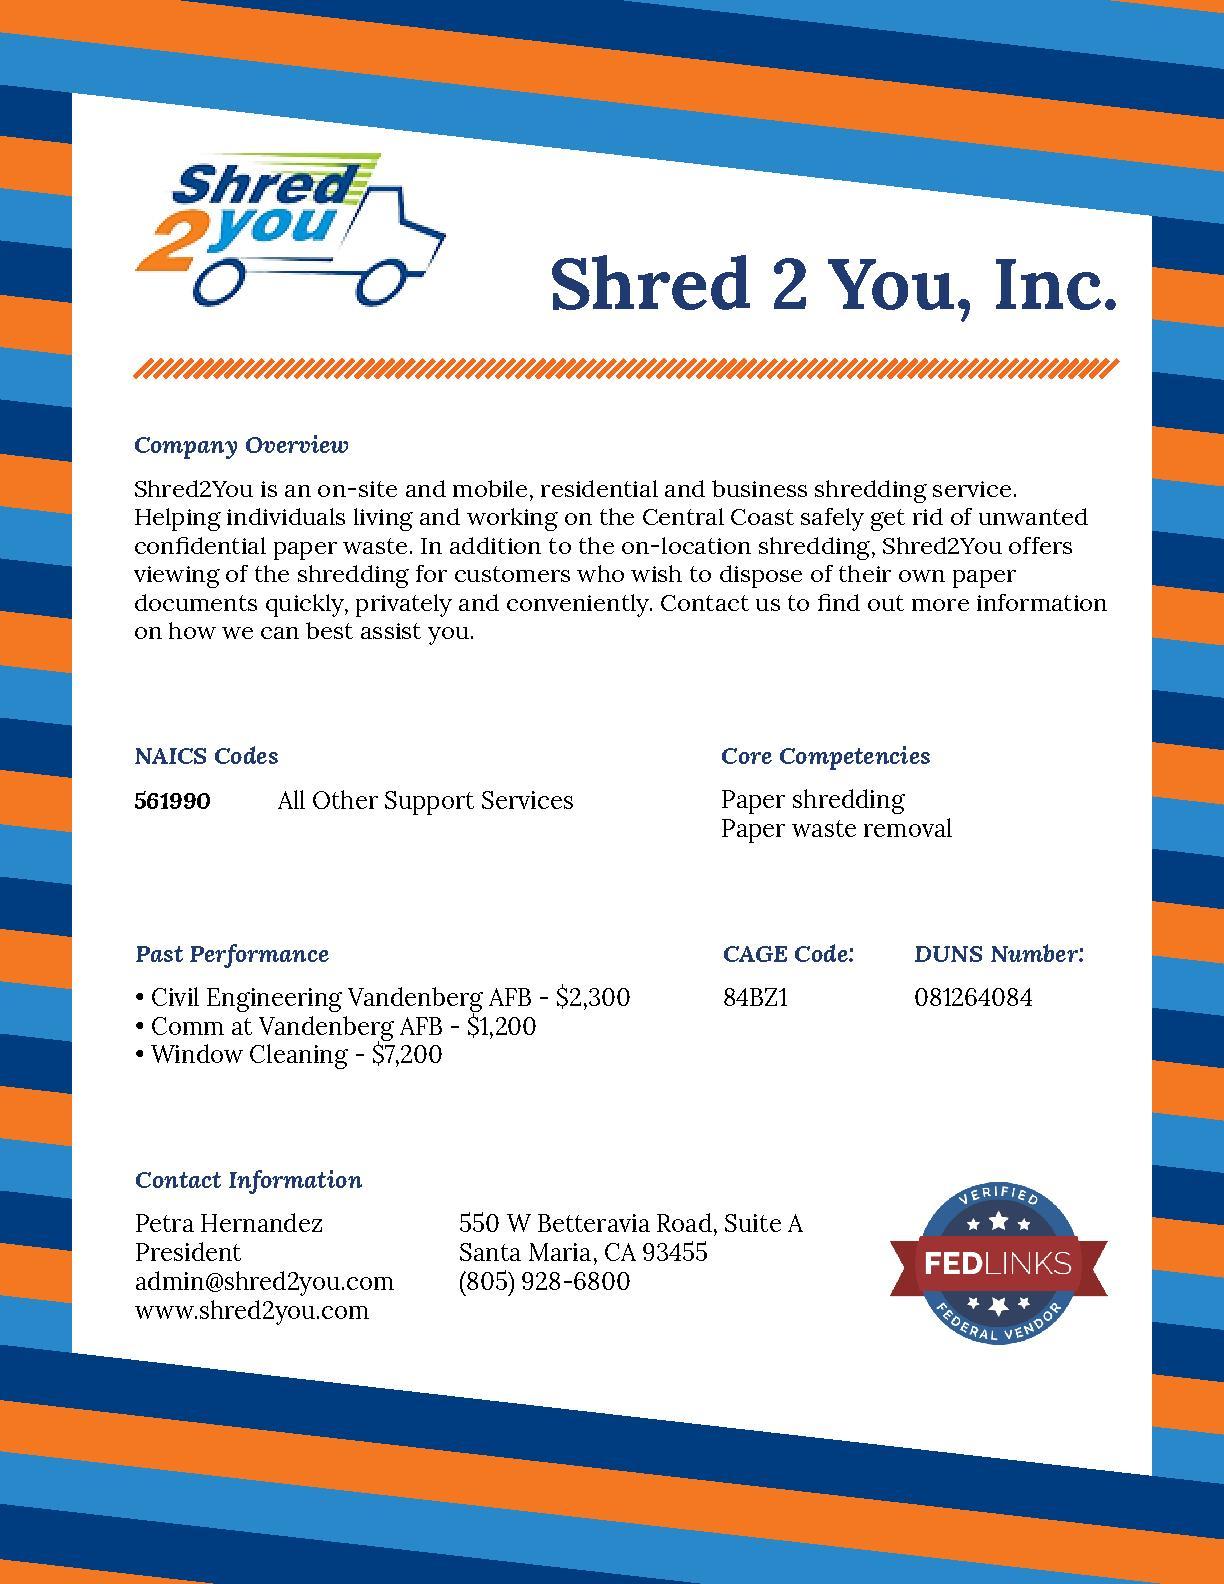 Shred 2 You, Inc